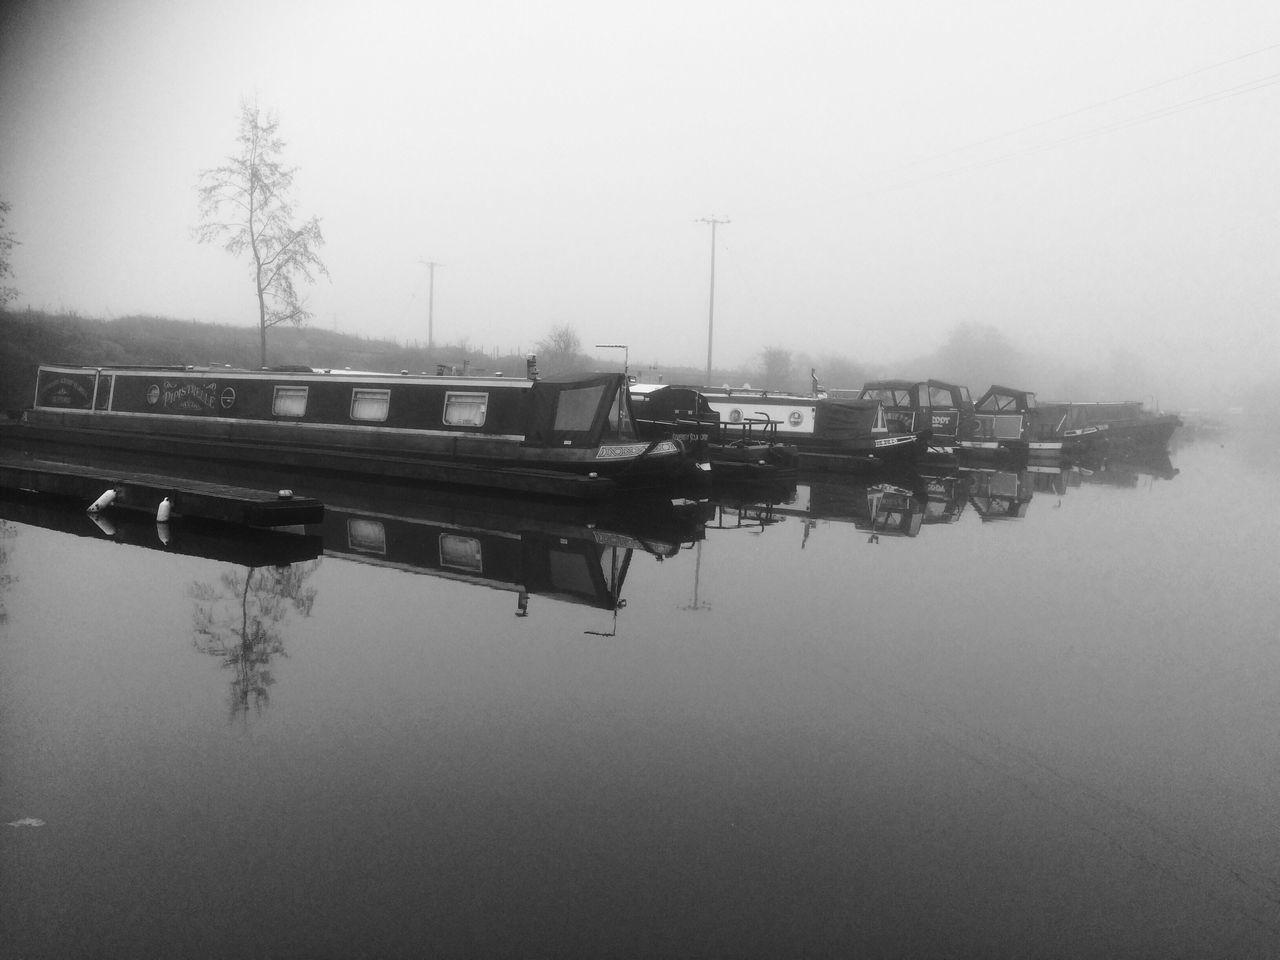 Fettlers Wharf